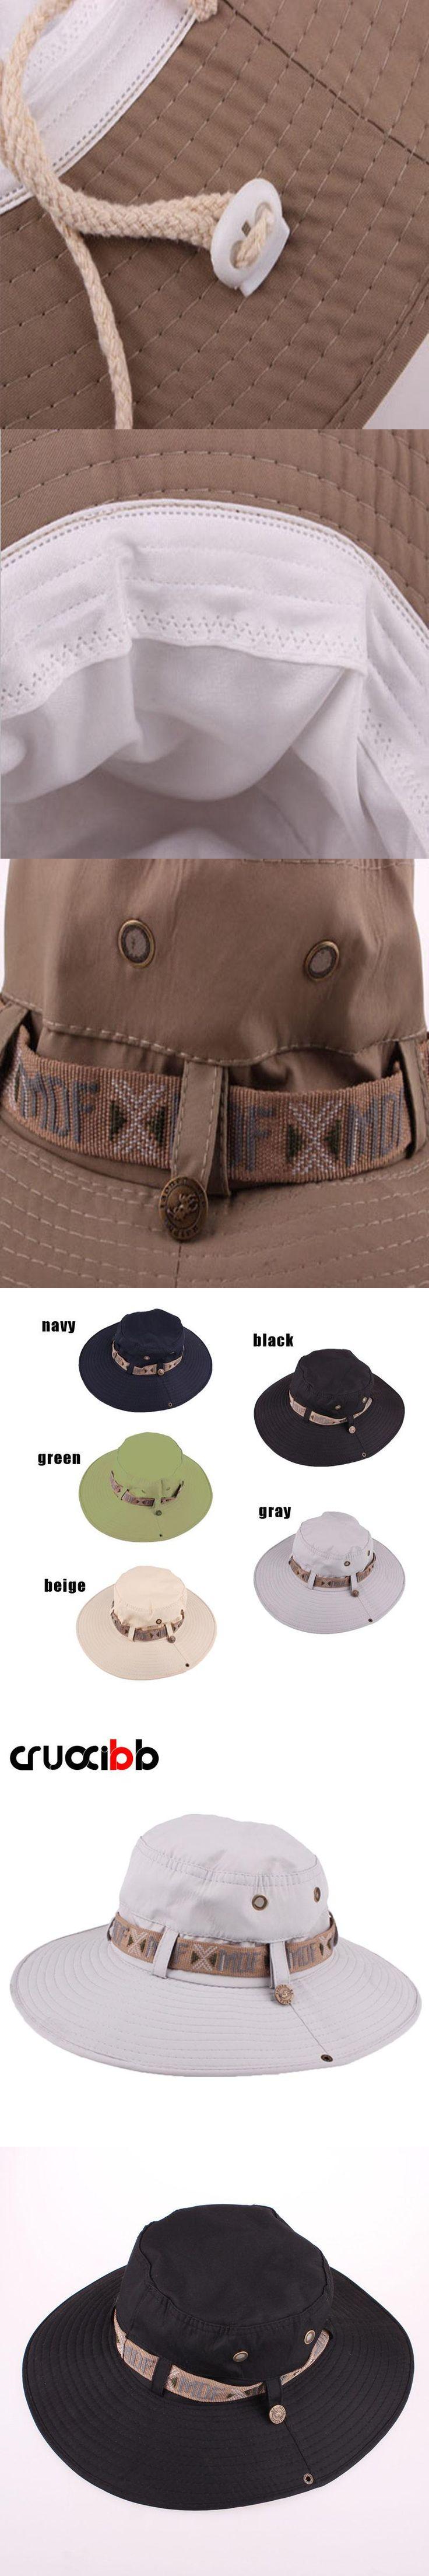 CRUOXIBB Summer Fashion Men's Sun Hat Bucket Hats Fishing Summer Hat For Men UV Protection Panama Hats Bone Chapeau Cap